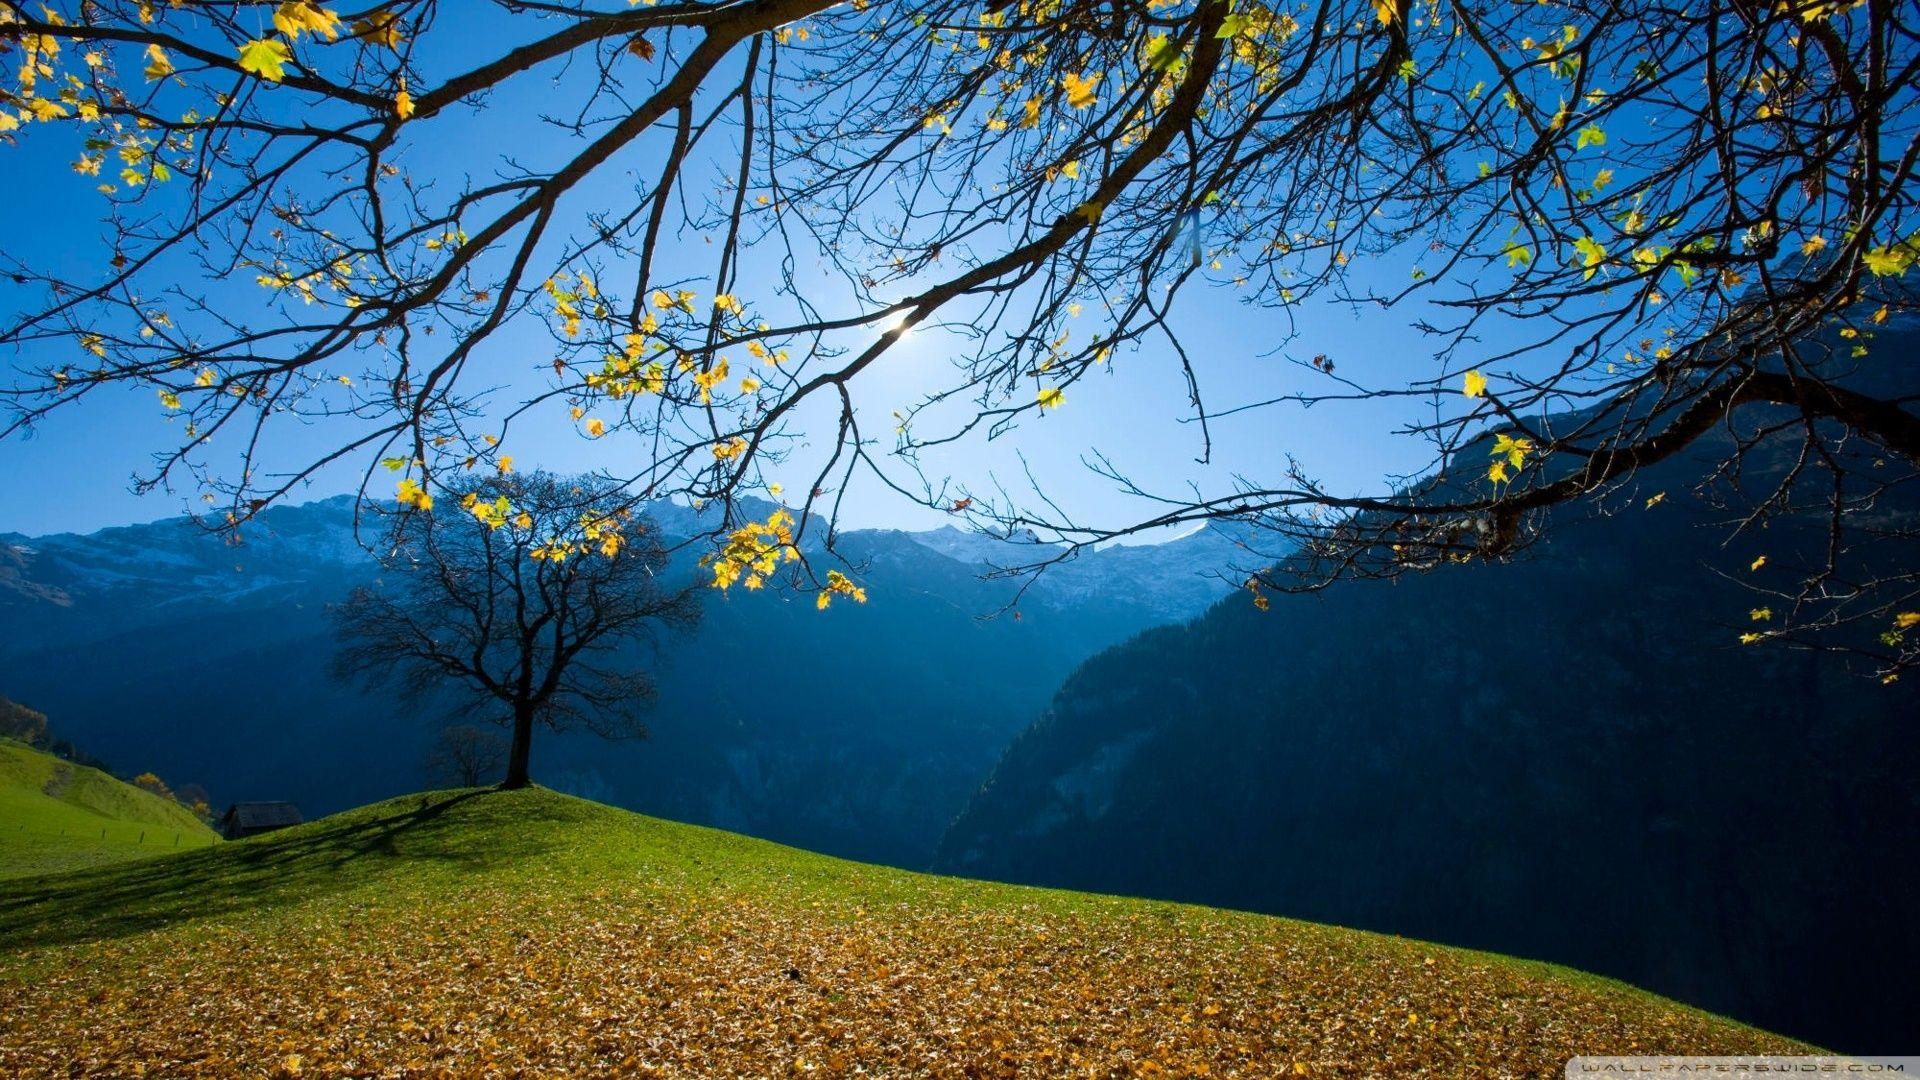 pin nature wallpaper landscape - photo #1